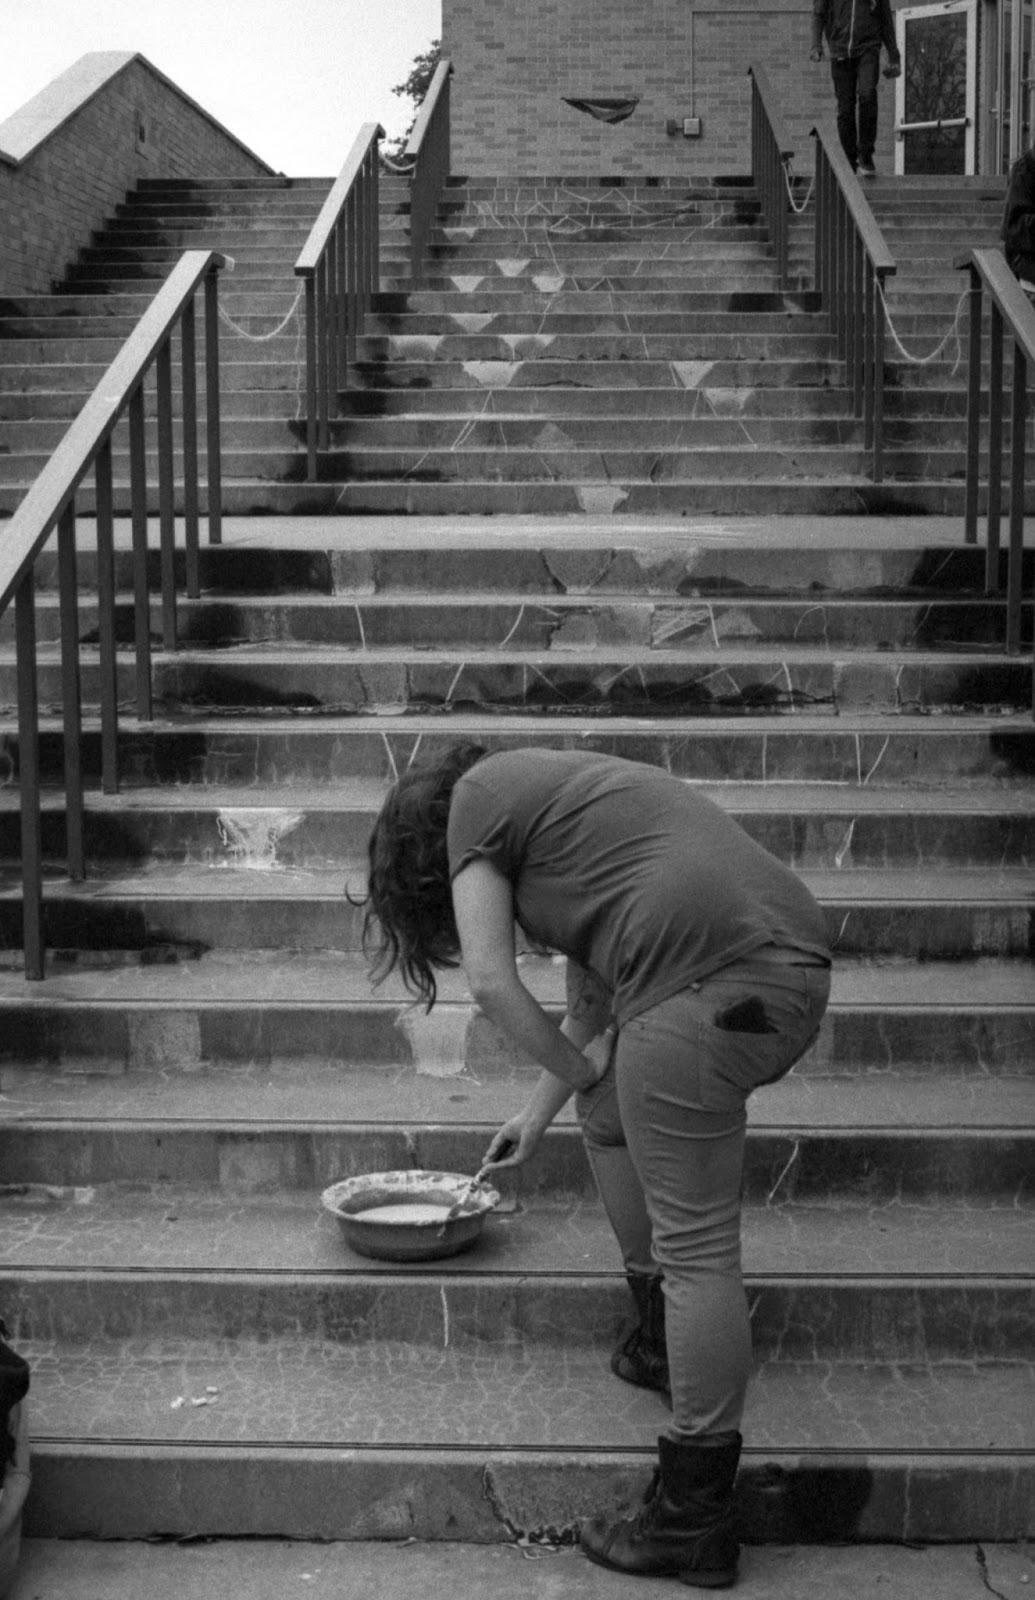 Student decorates steps of Fine arts building UT Austin campus